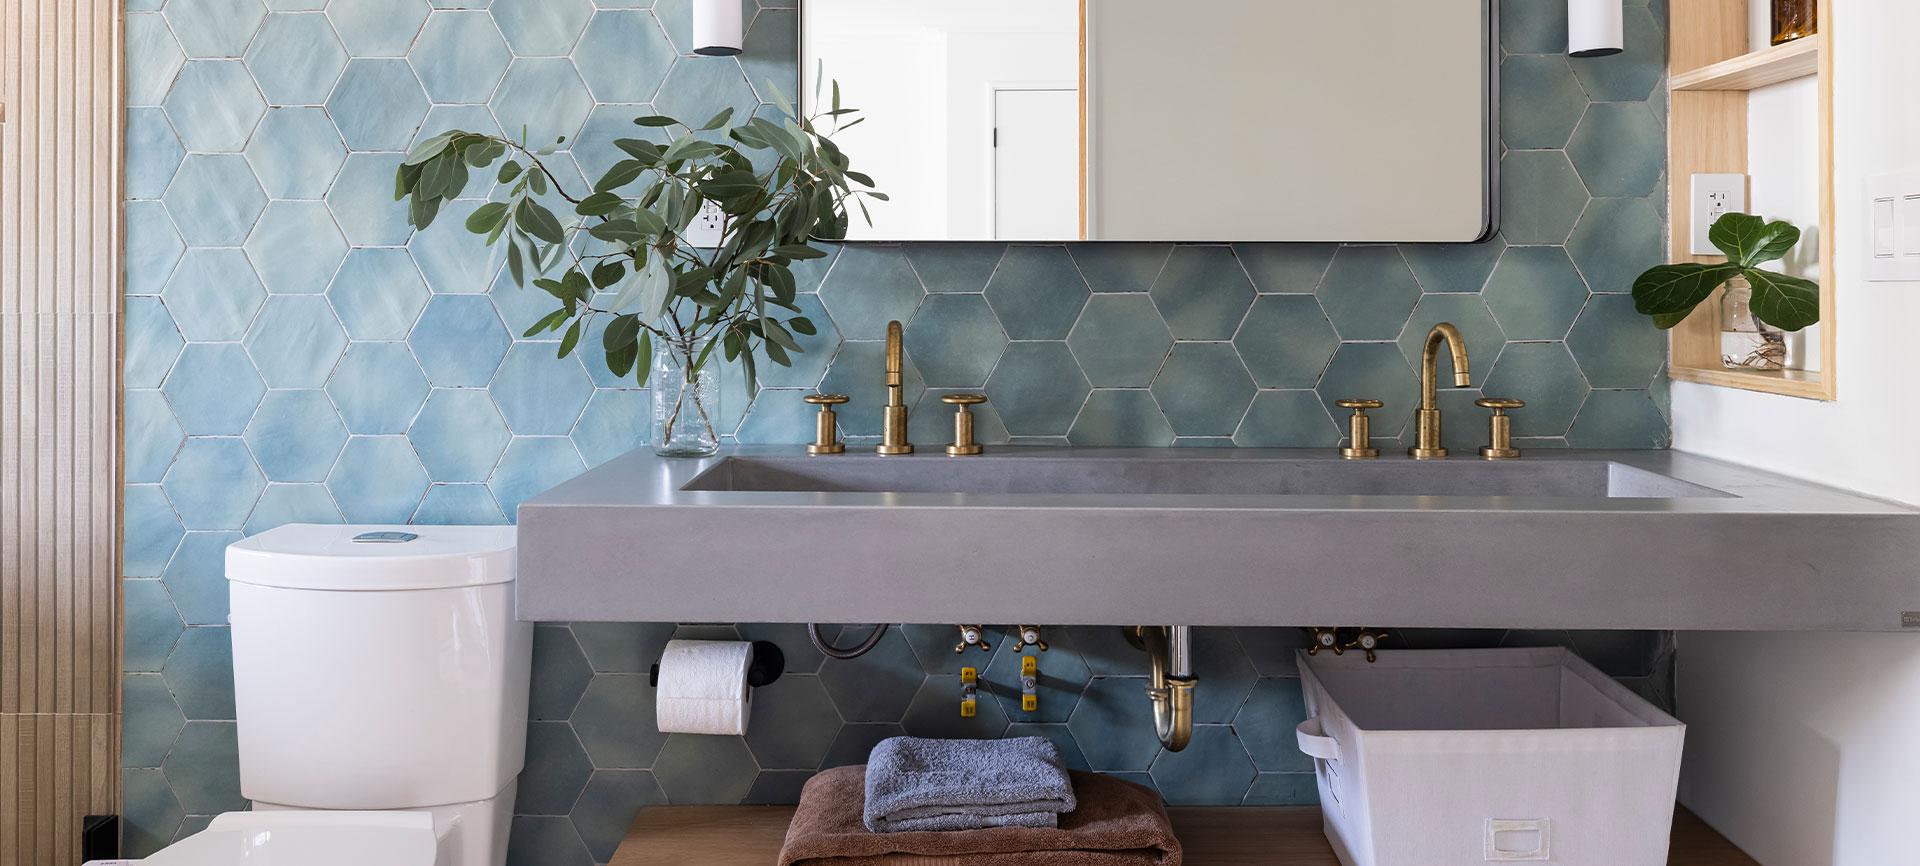 Custom concrete wall-mount sinks